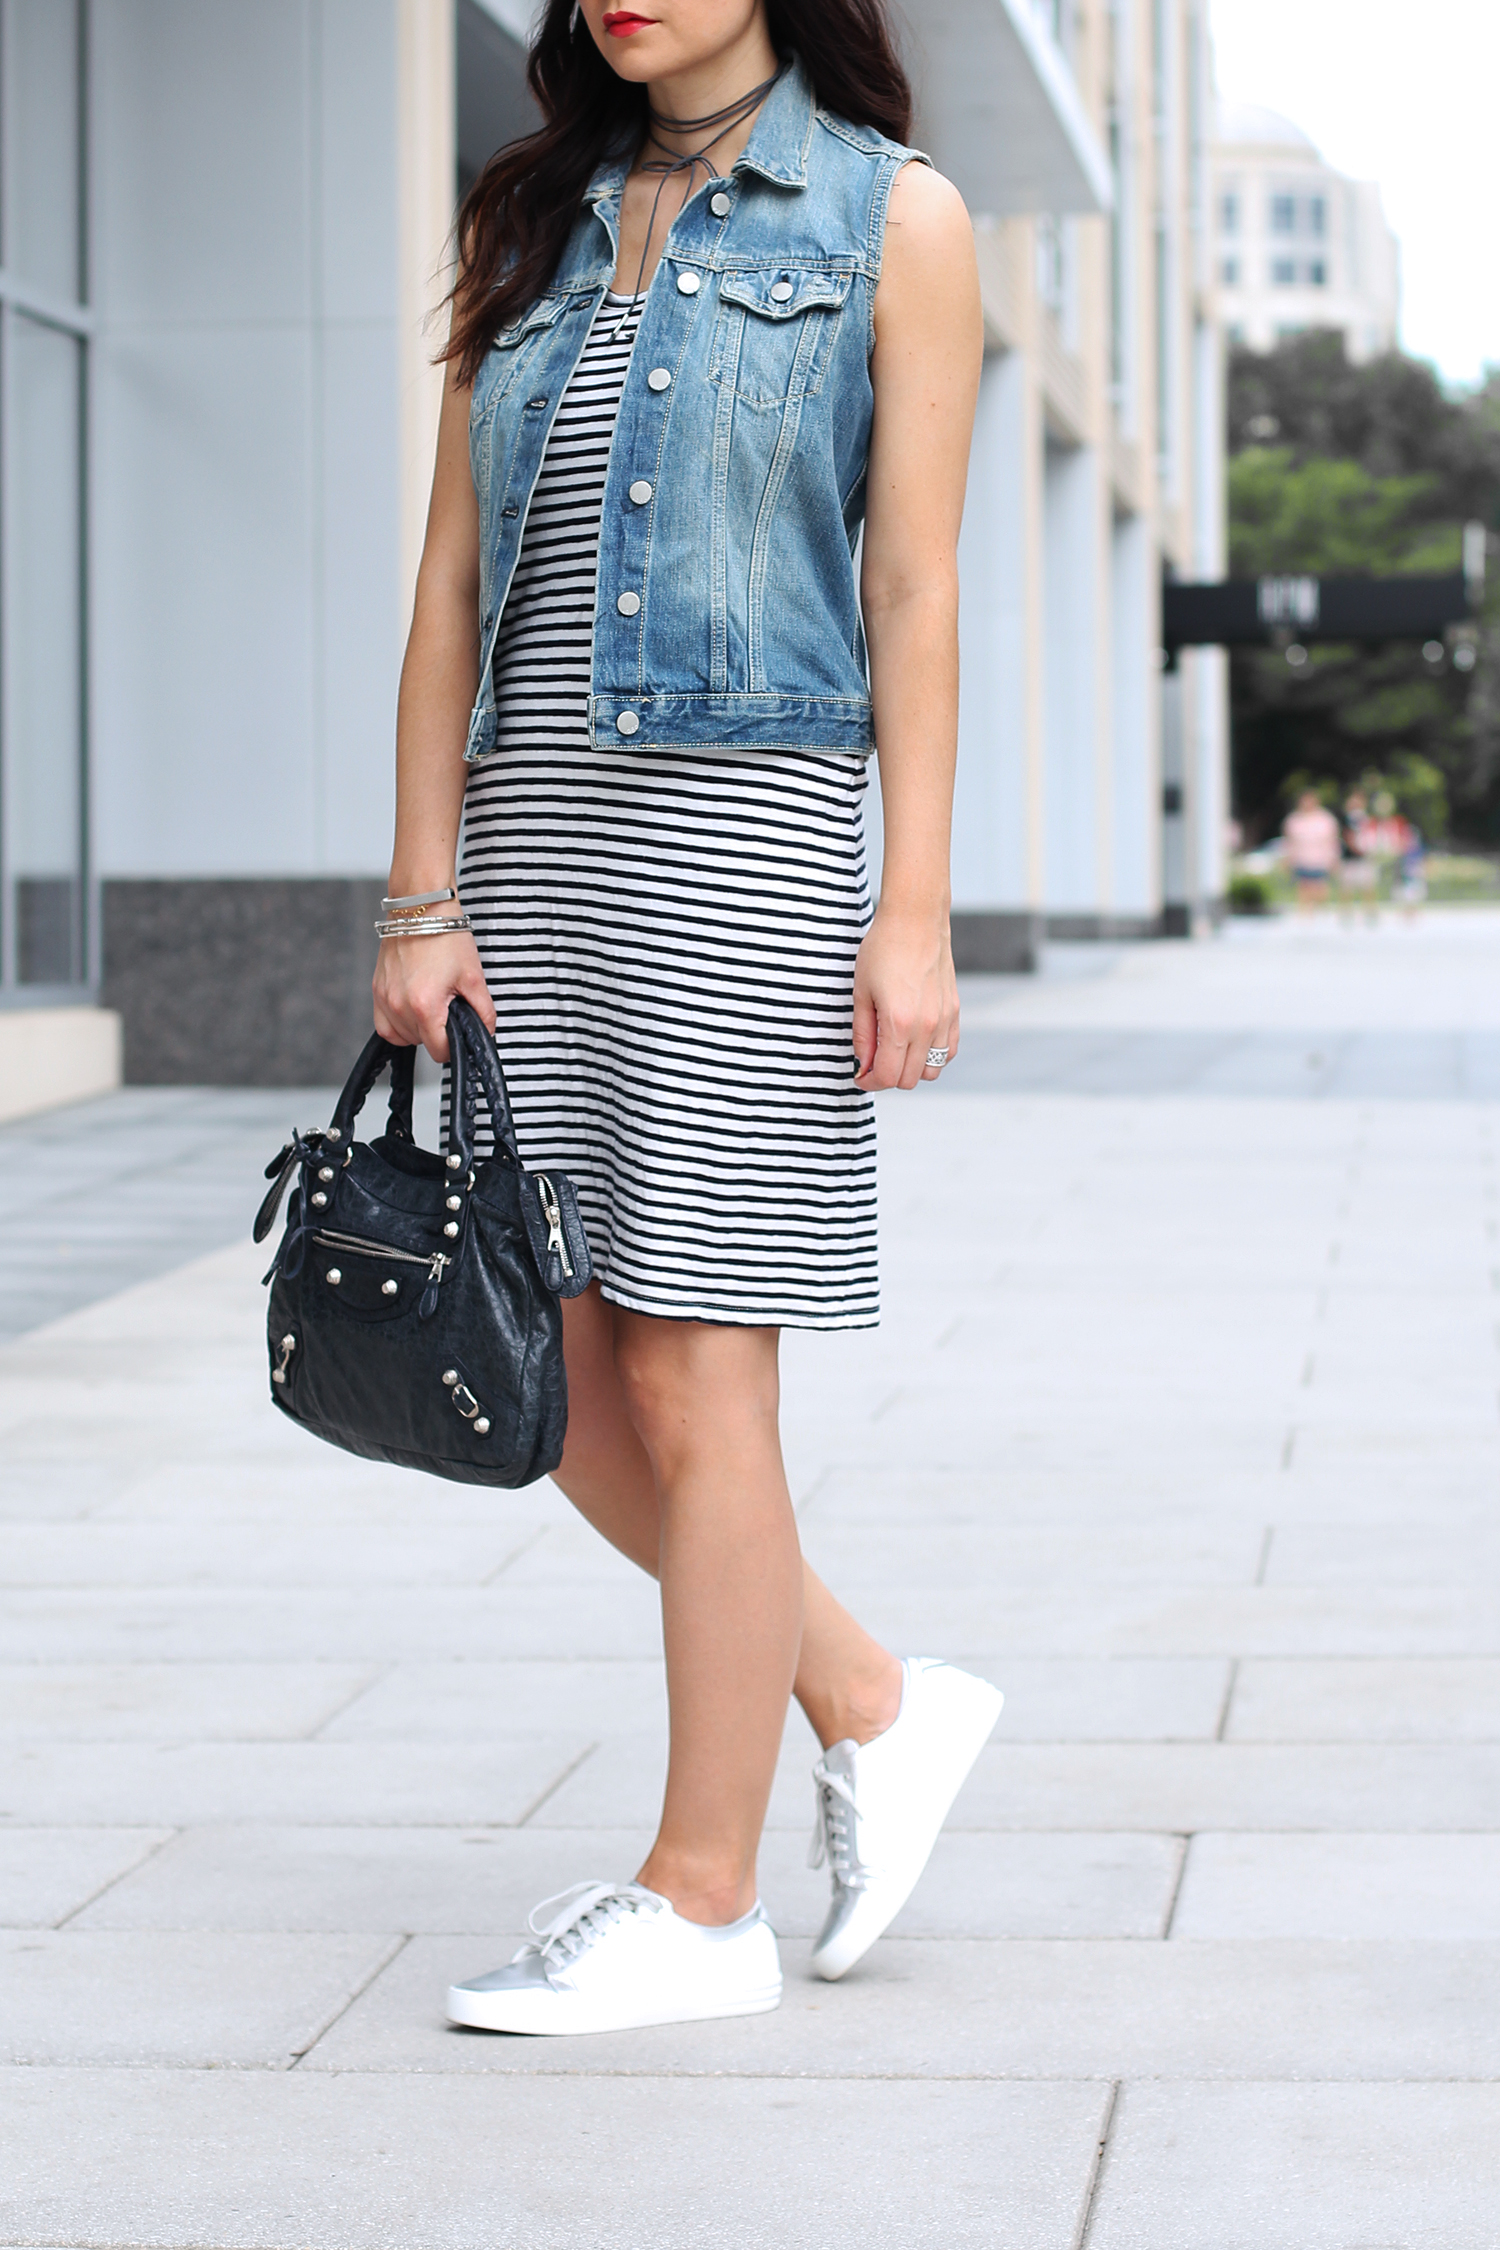 Denim Vest over a Dress, Striped Cotton Dress